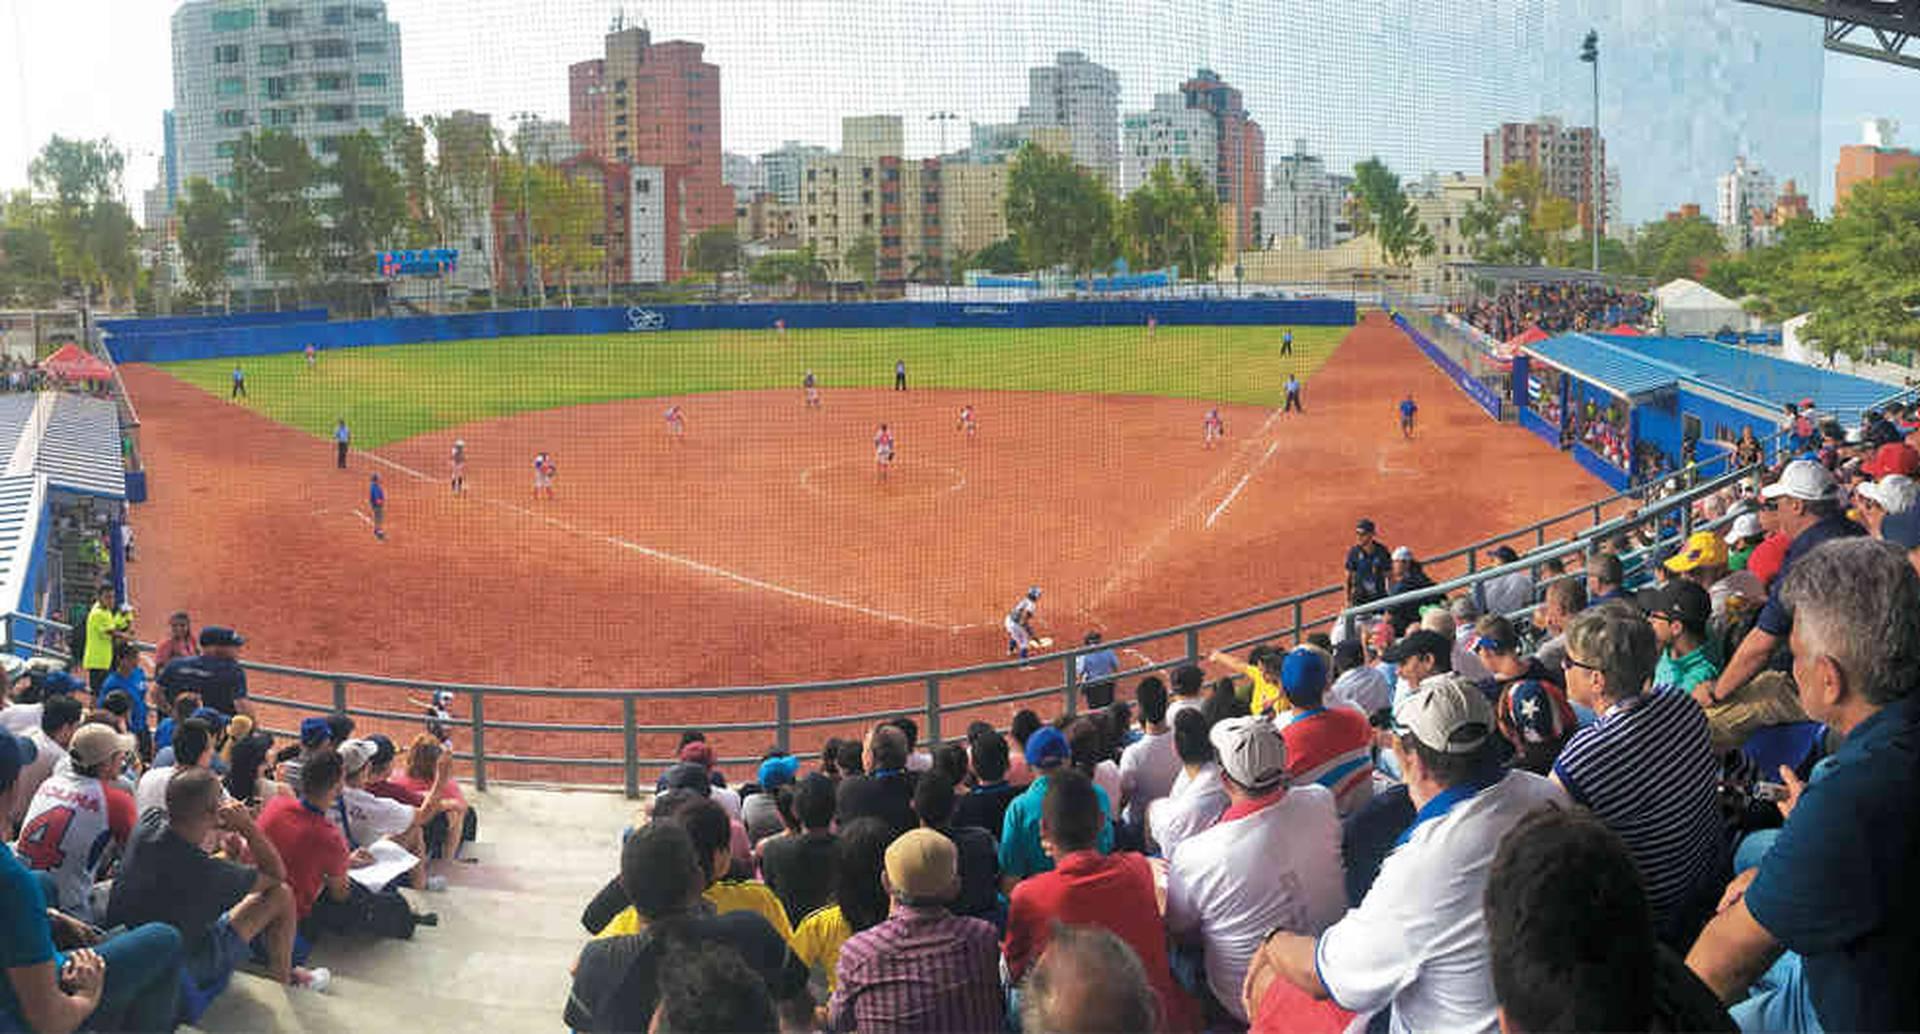 Mundial de béisbol en Barranquilla